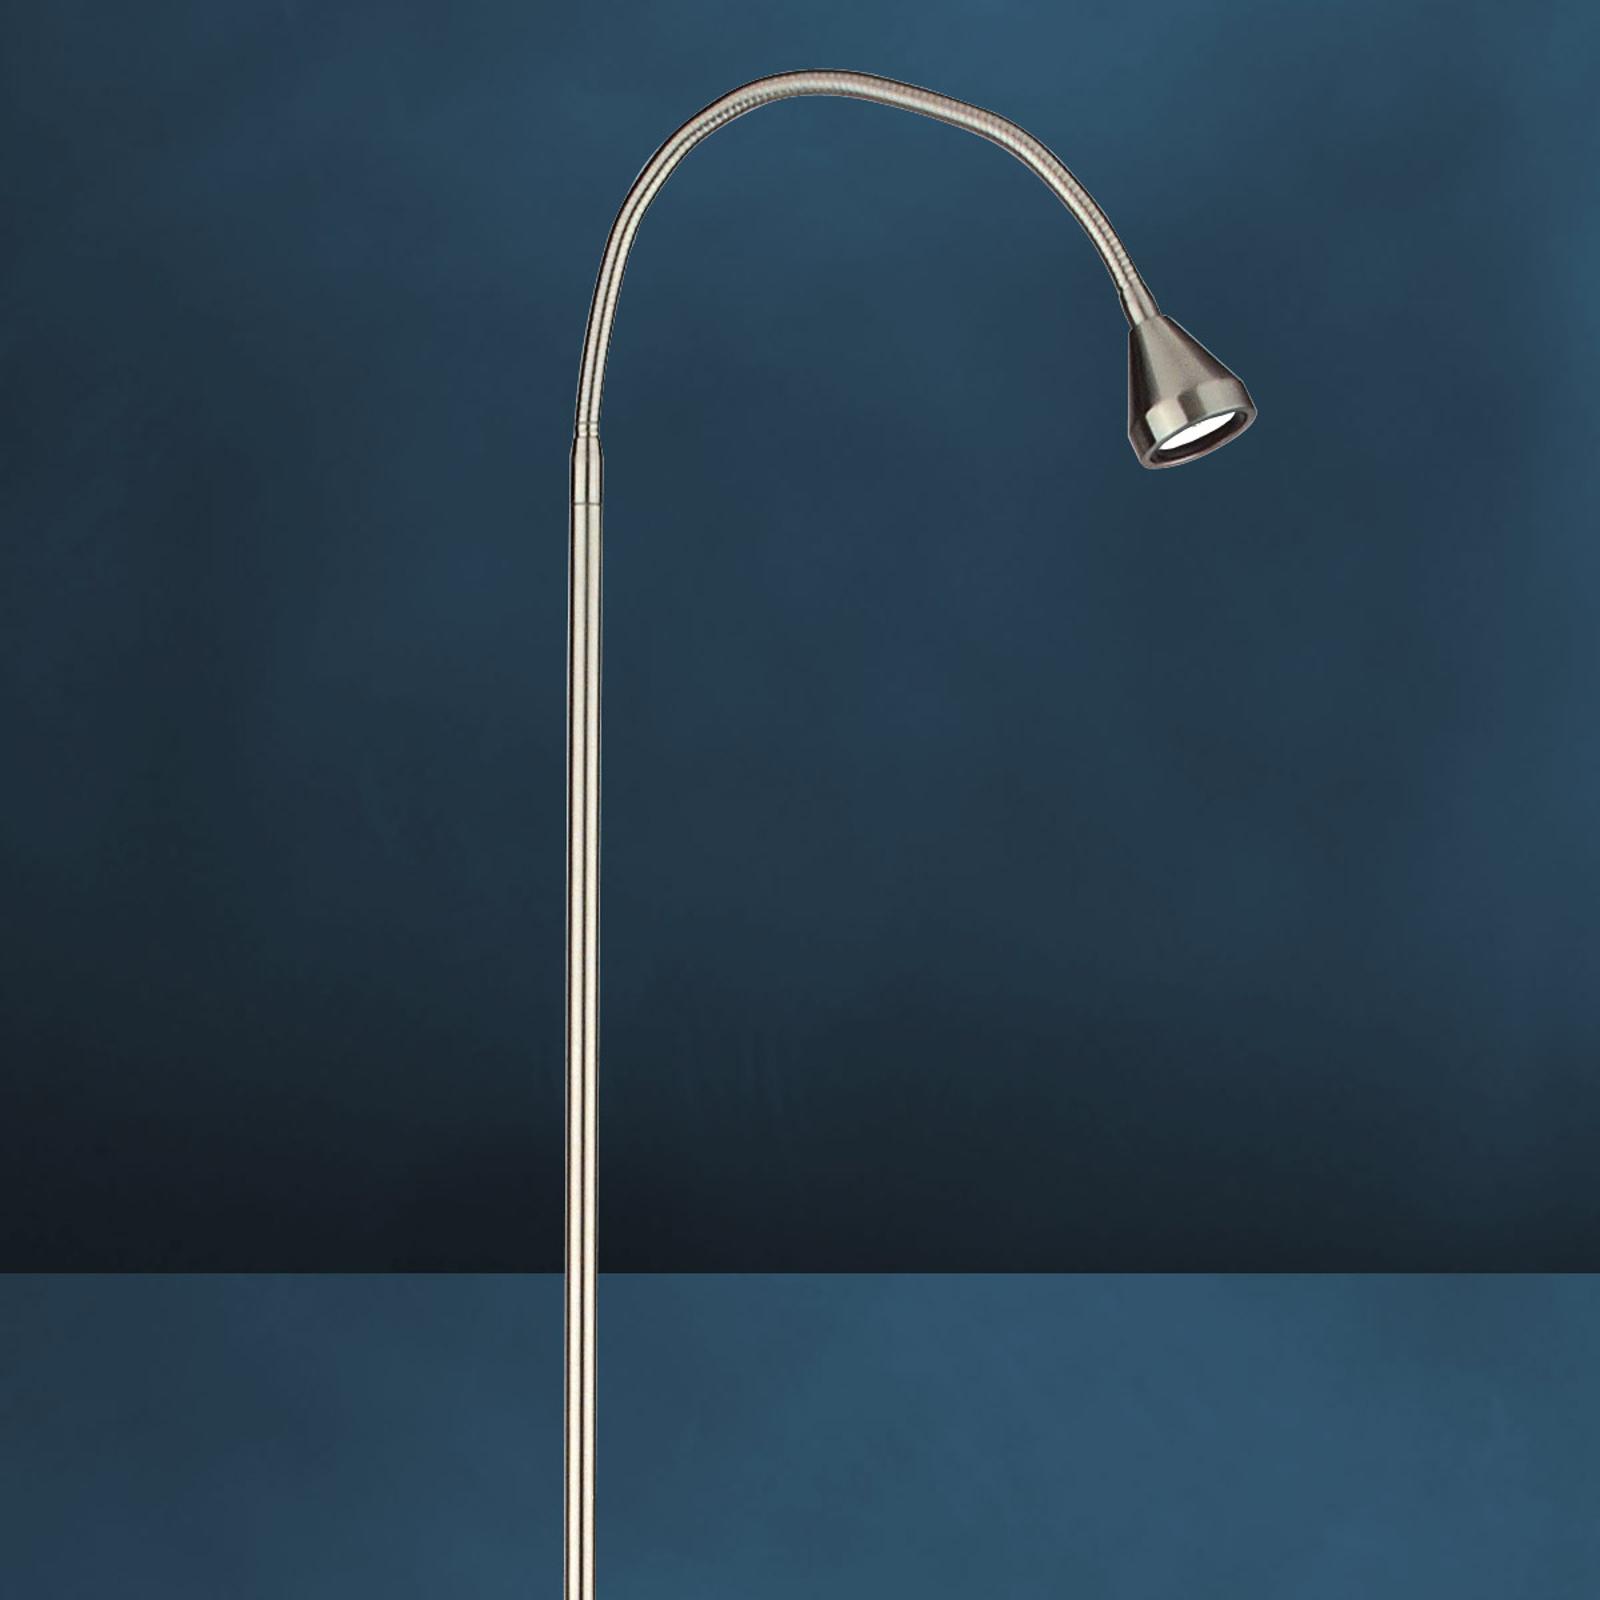 Moderne LED-vloerlamp MINI universeelwit